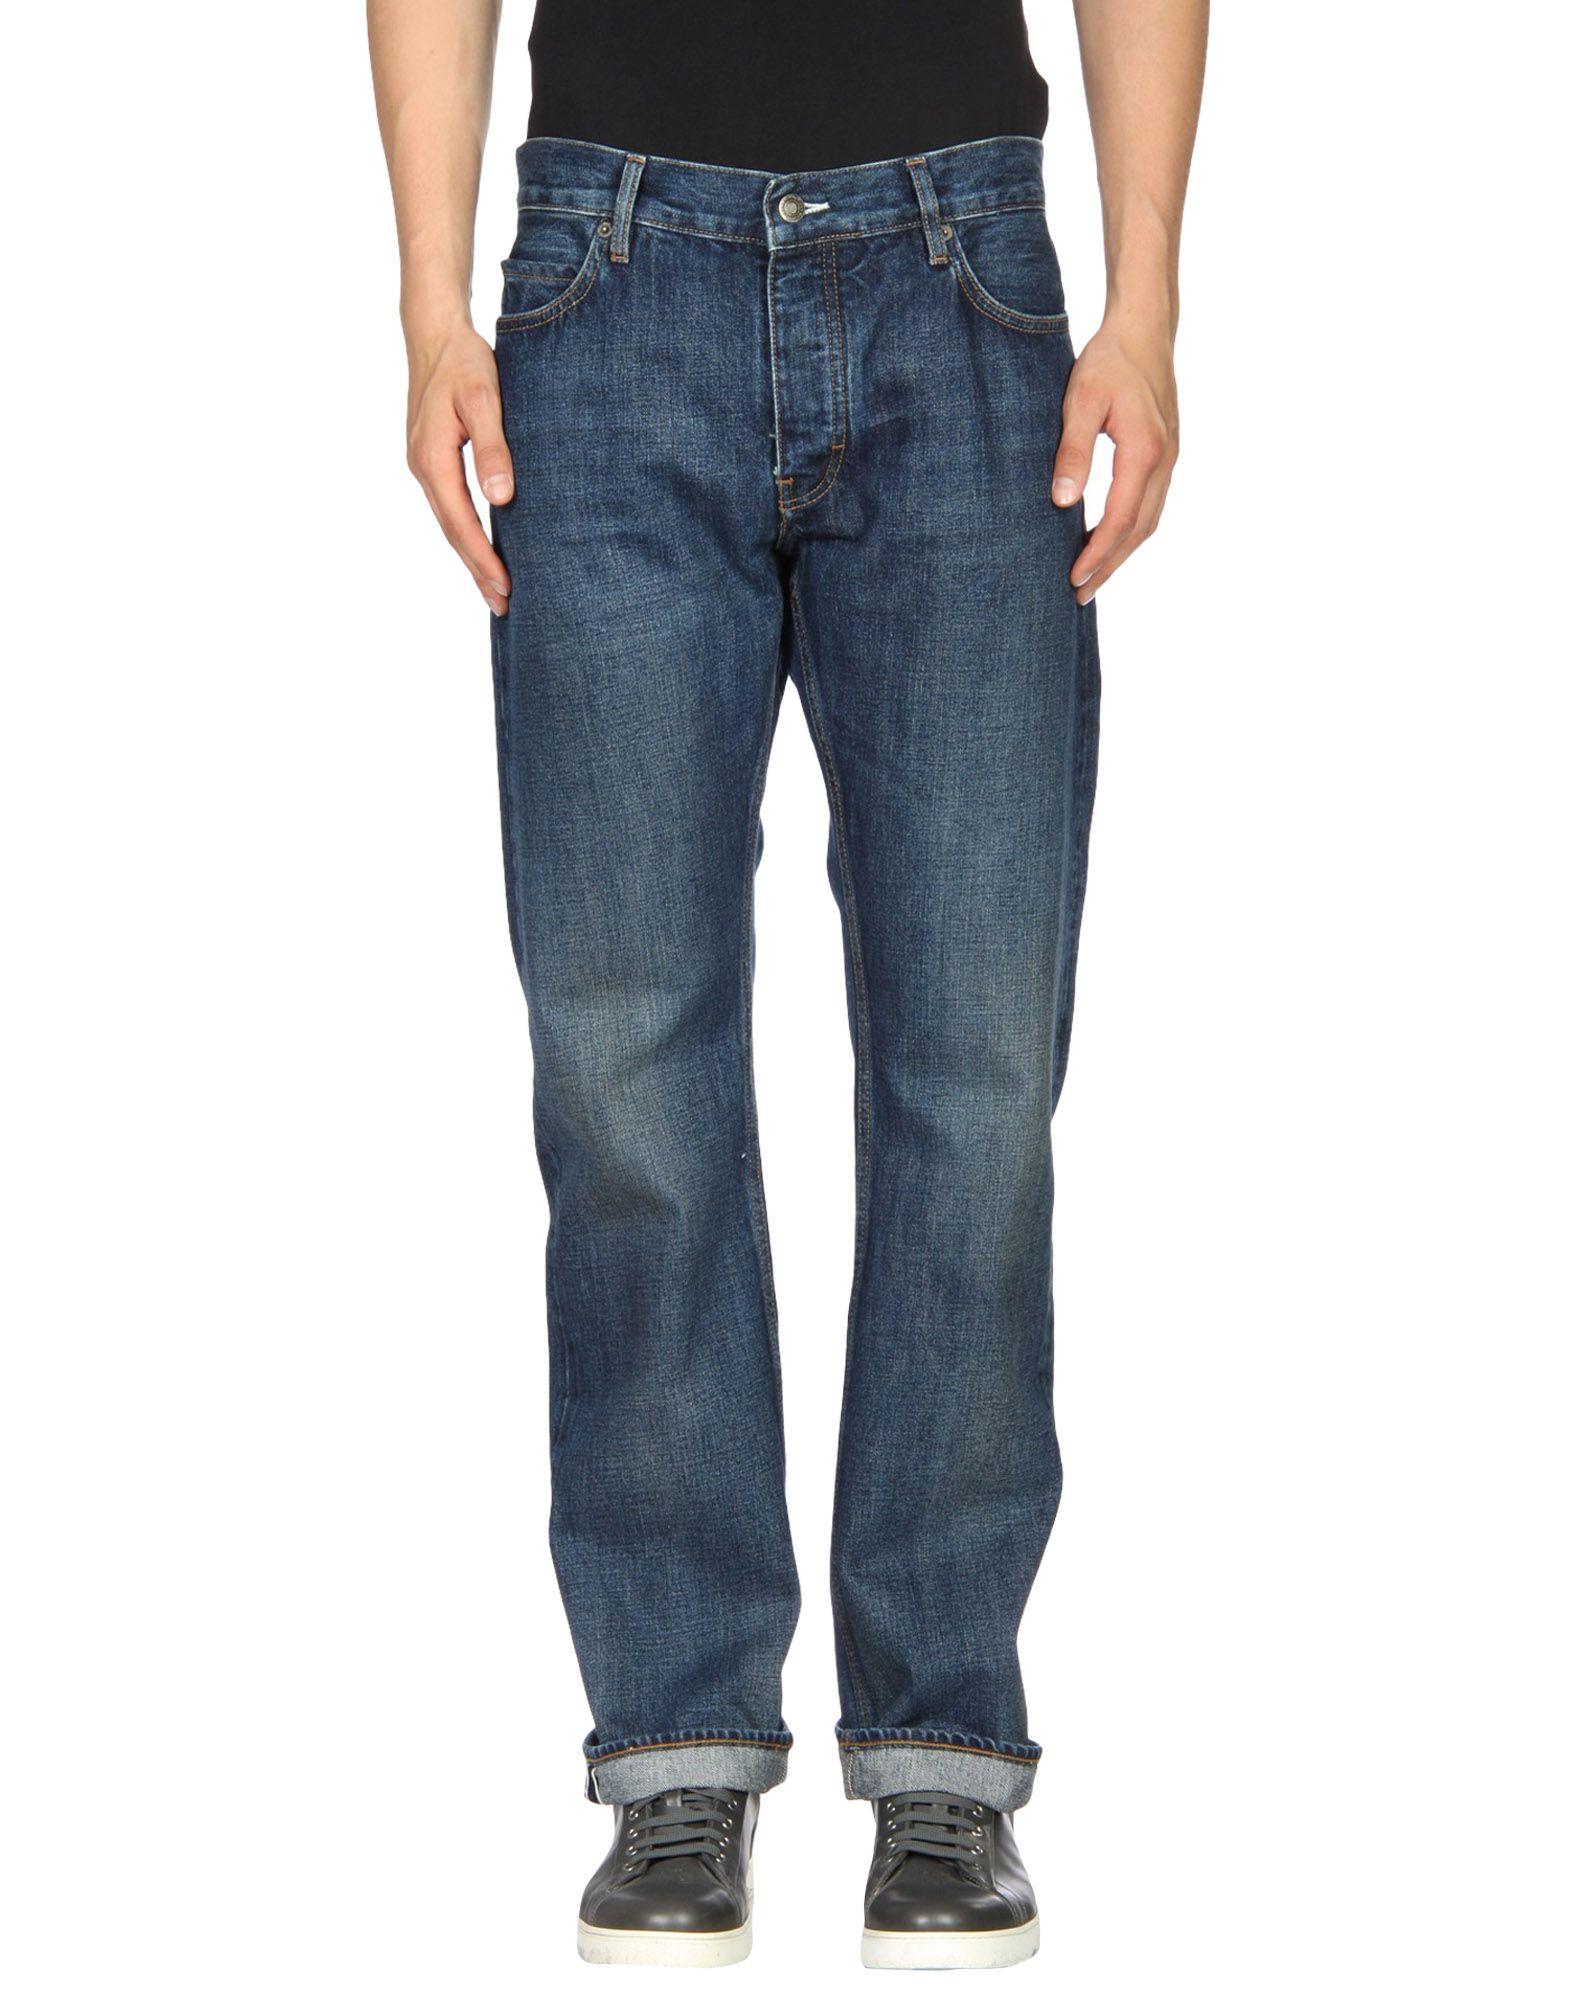 Jean.machine Jean. Machine Jeans